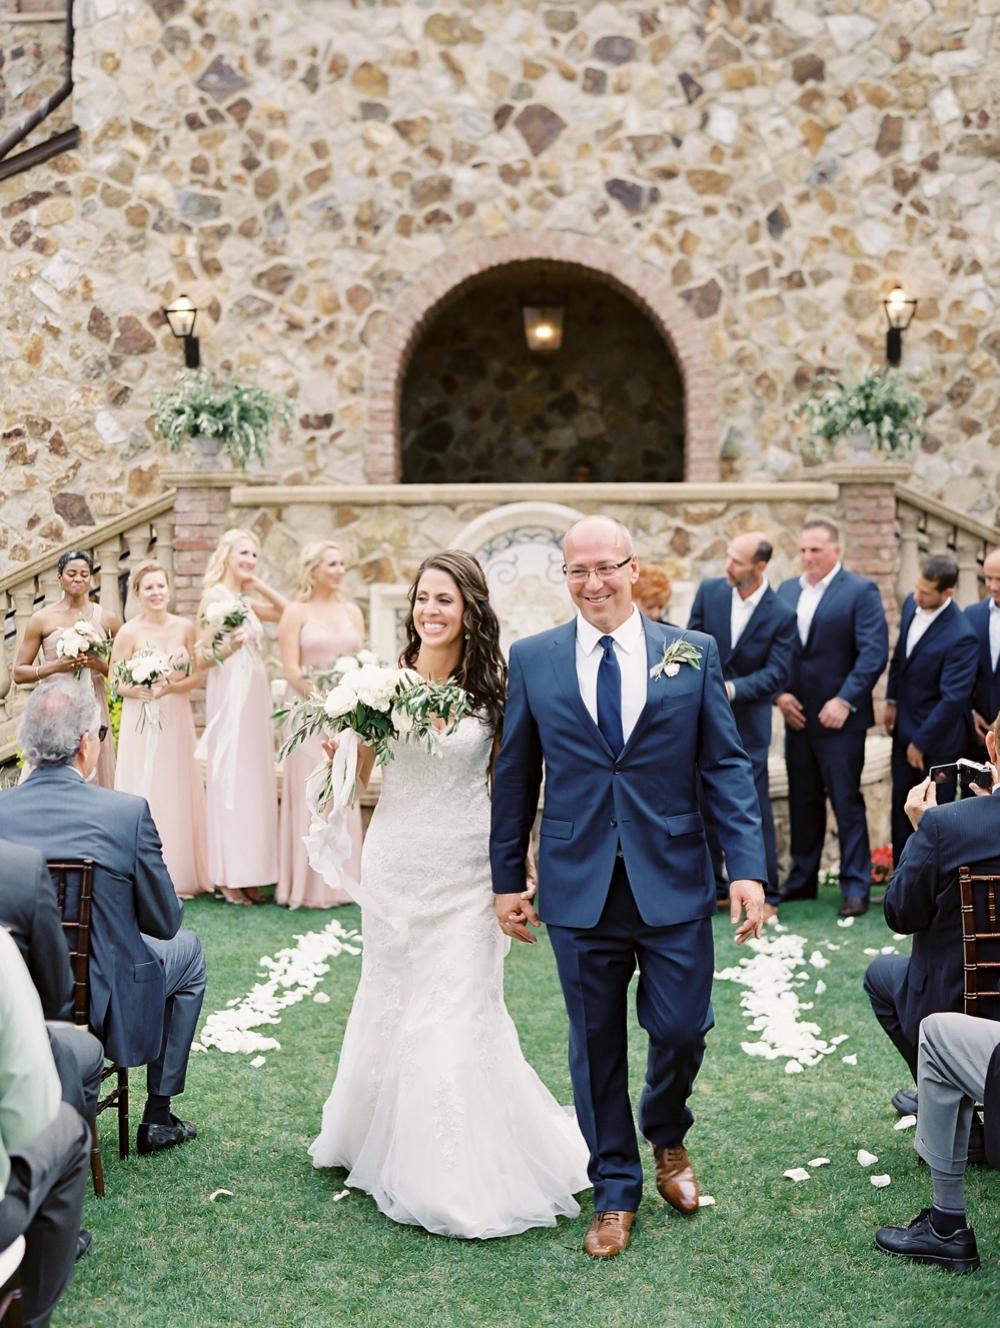 Vicki Grafton Photography - Fine Art Film Wedding Photographer - Bella Collina Wedding_0058.jpg